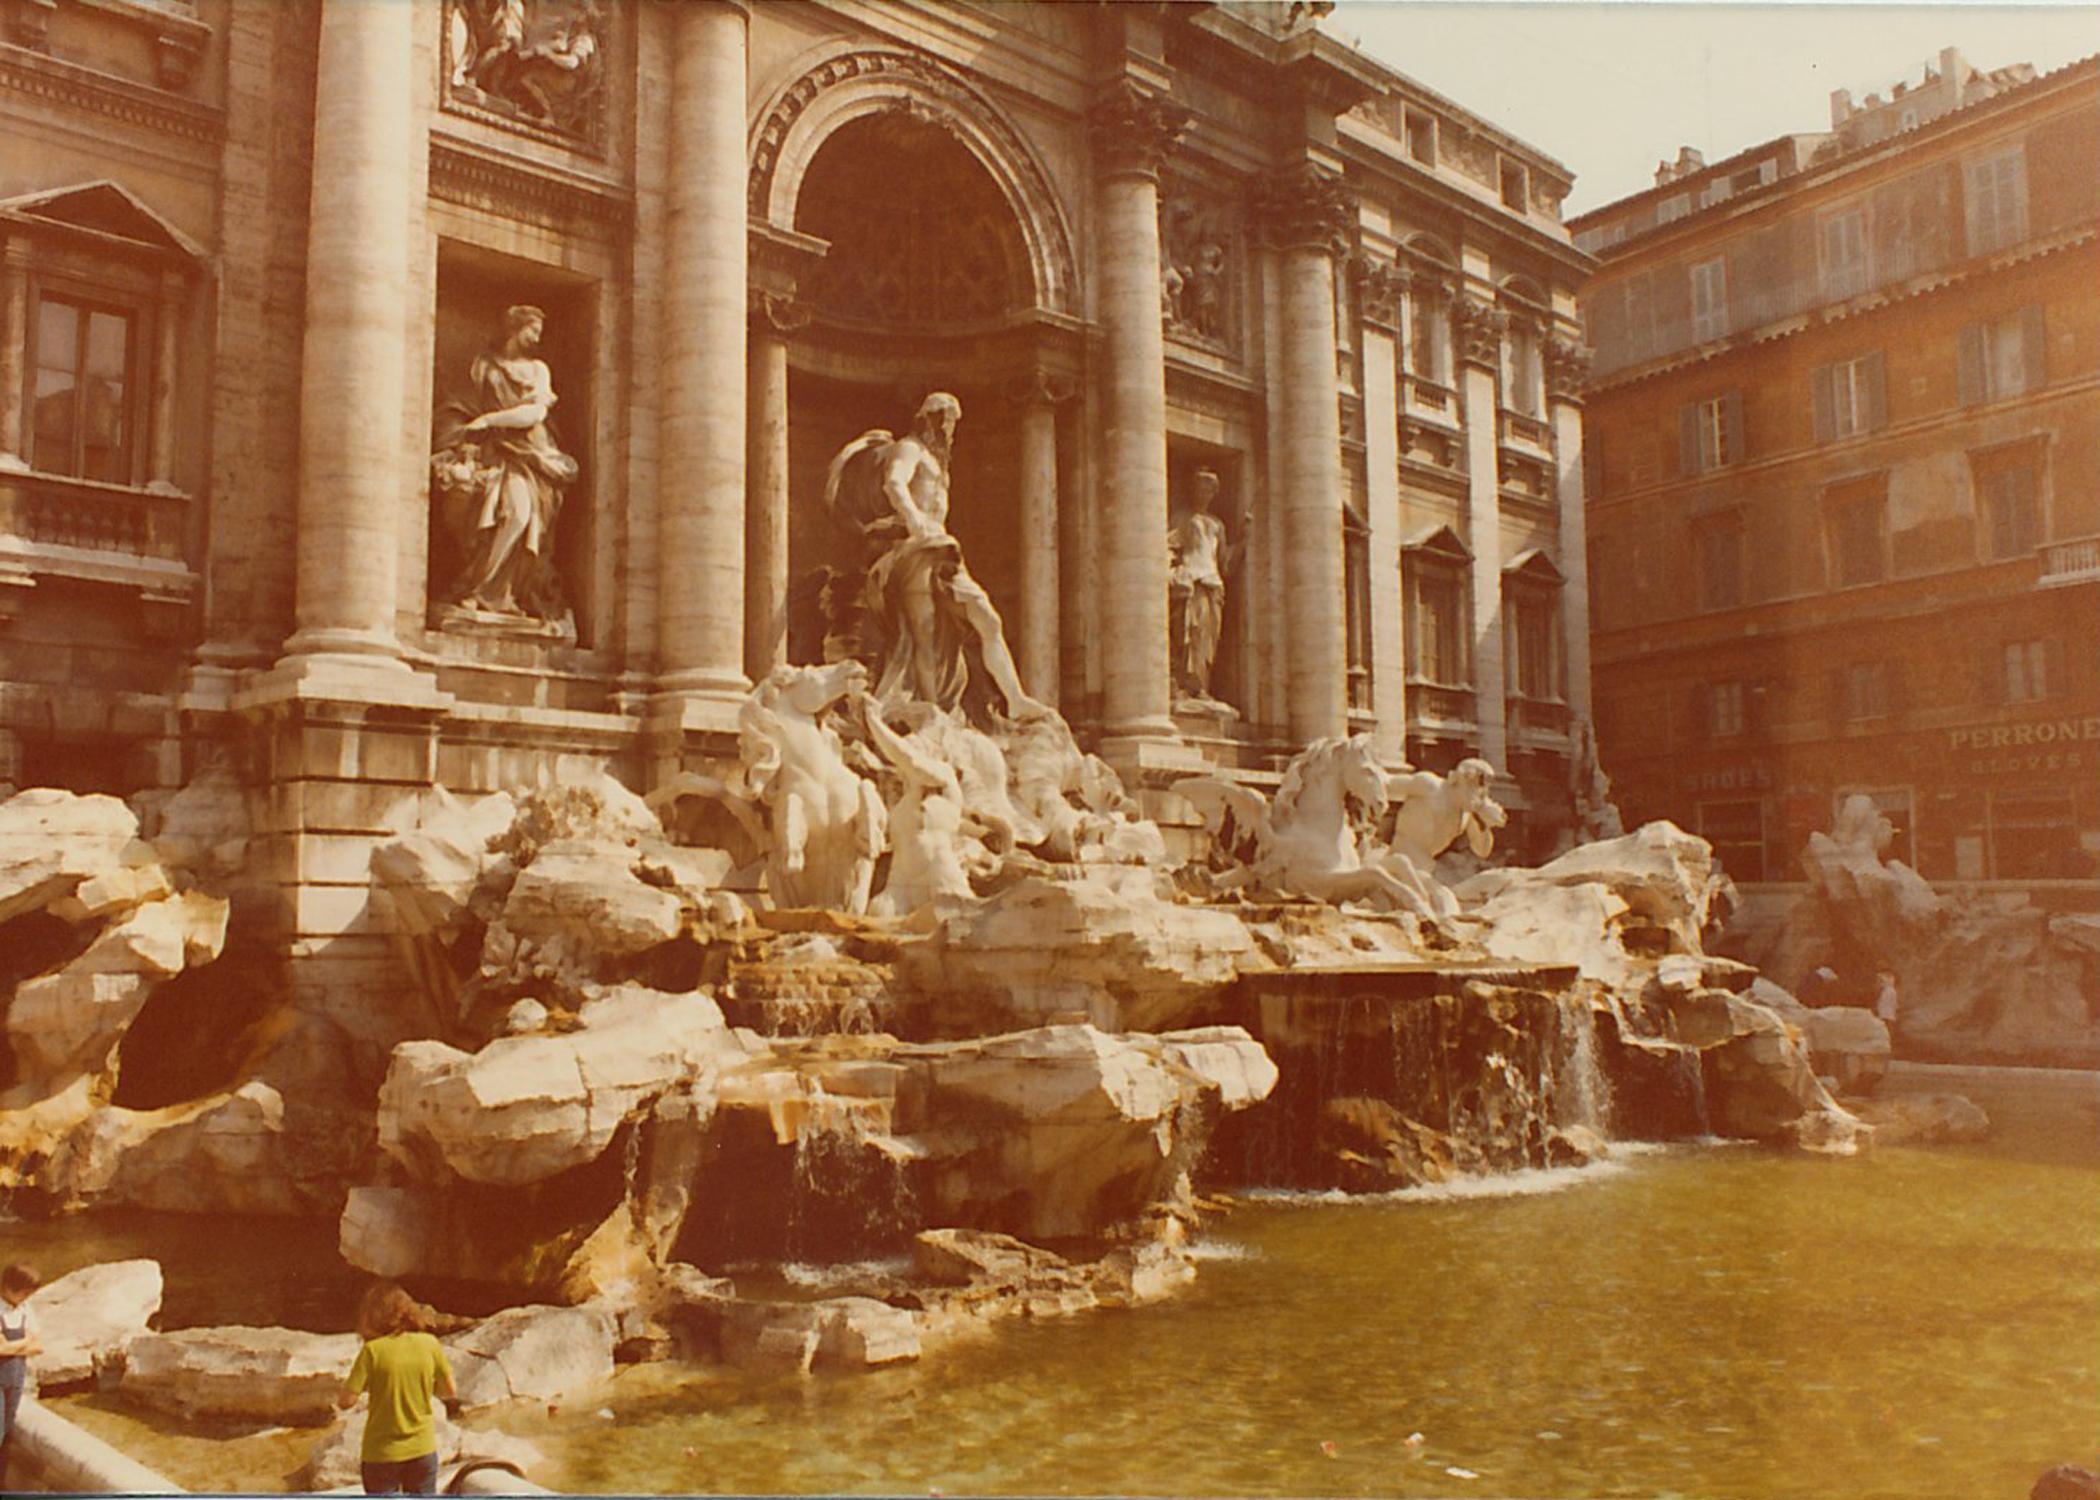 The glorious Trevi Fountain.